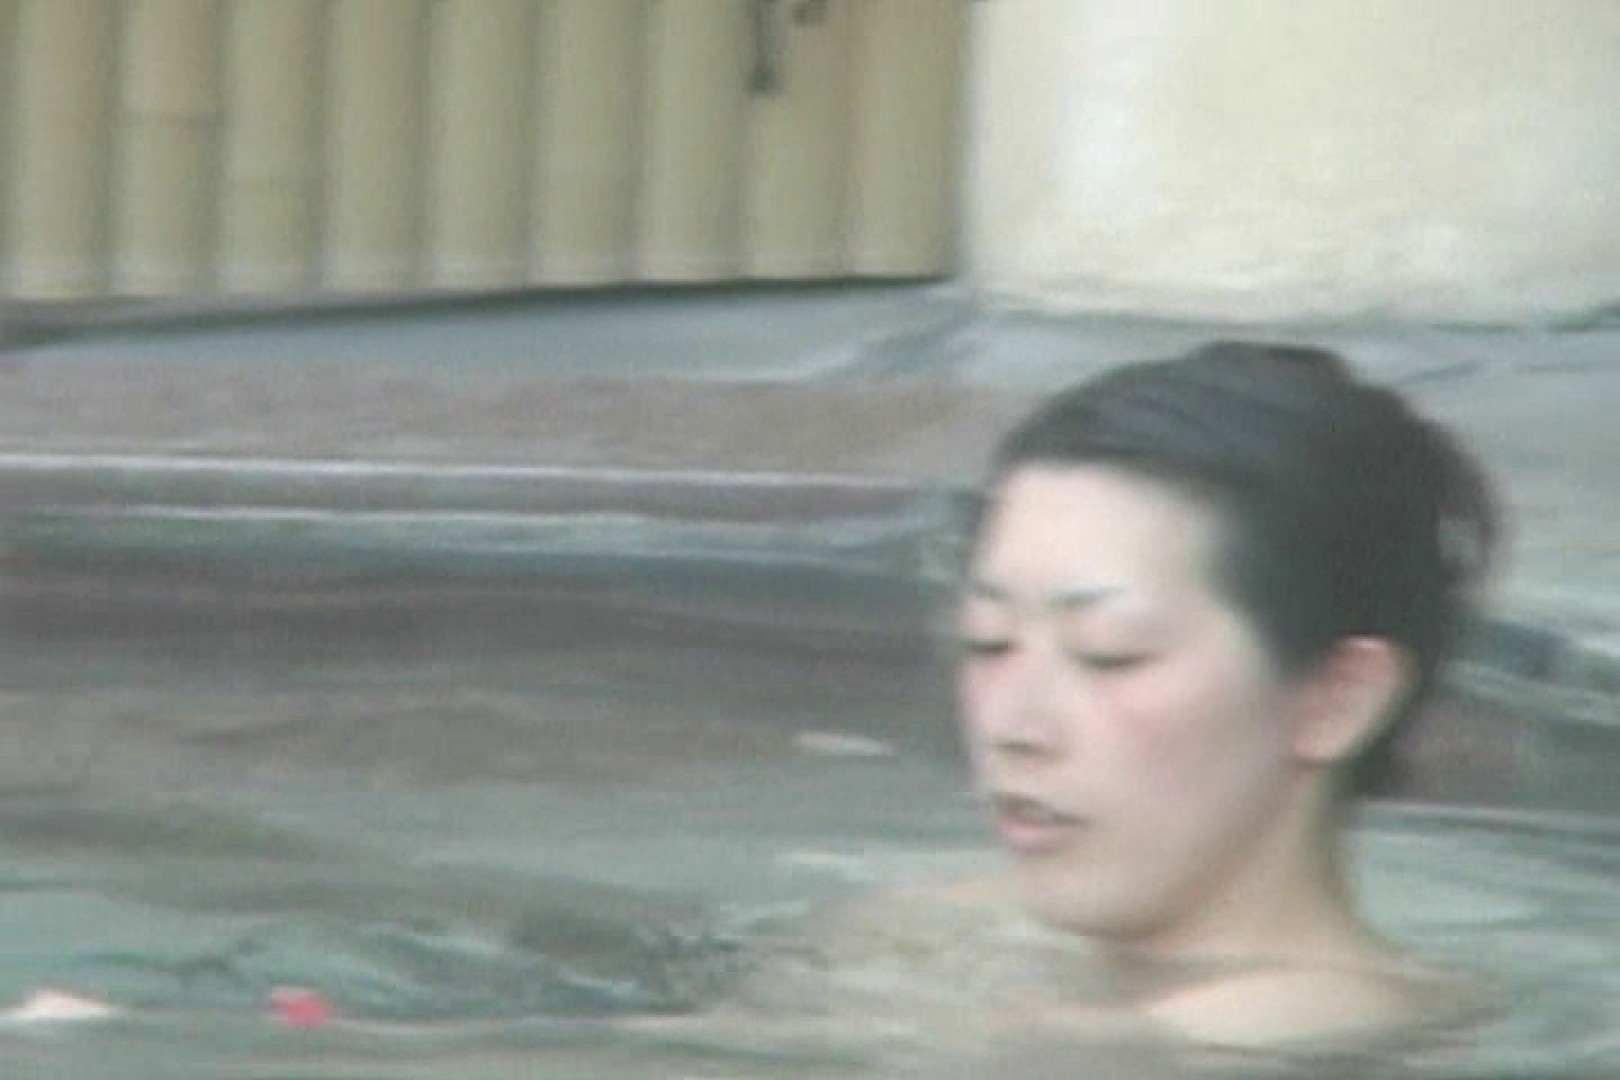 Aquaな露天風呂Vol.589 盗撮 | HなOL  105pic 5